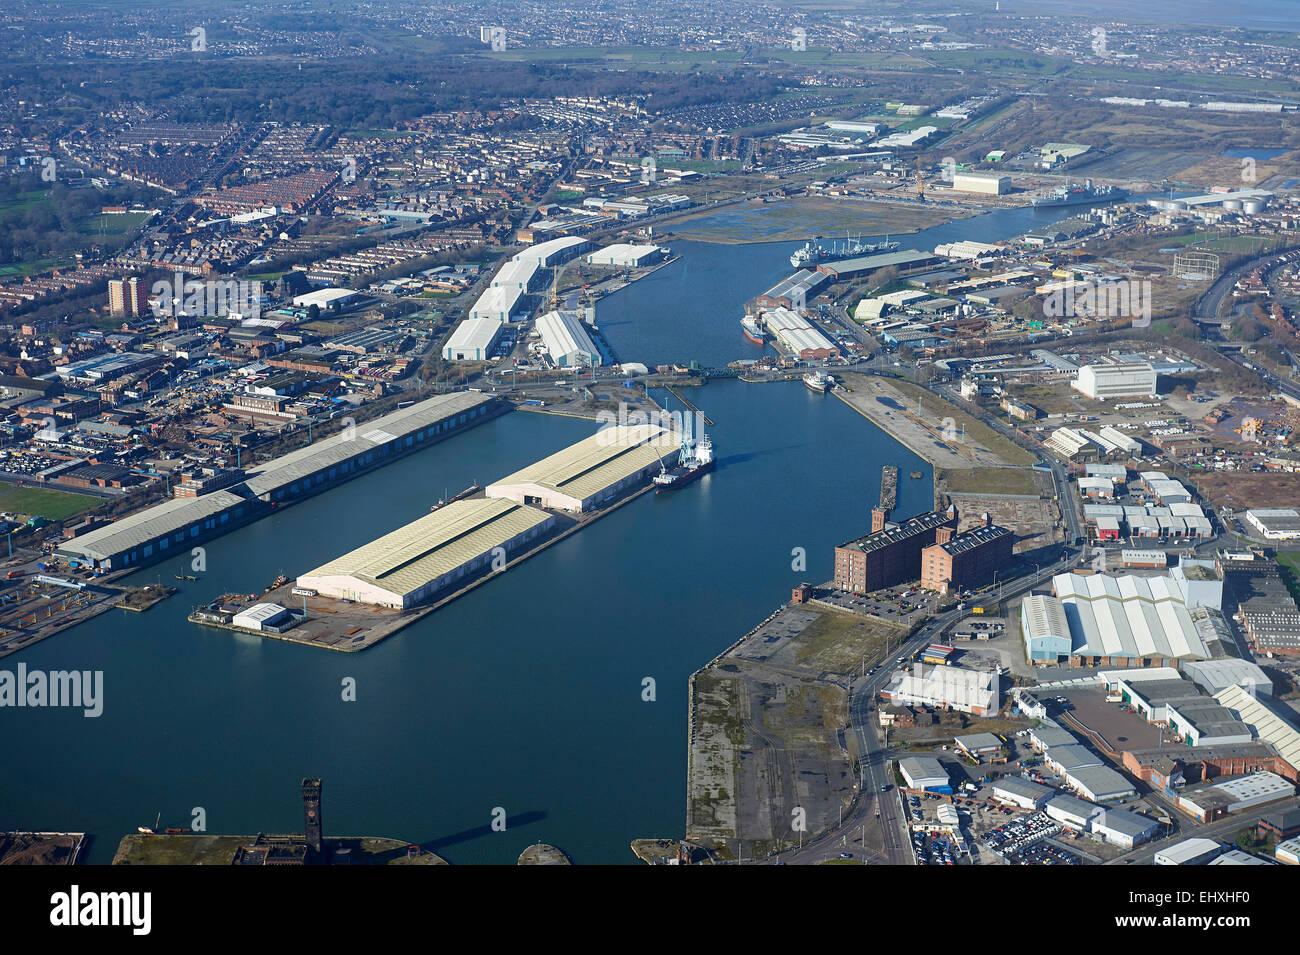 Birkenhead Docks, Merseyside, North West England, UK - Stock Image